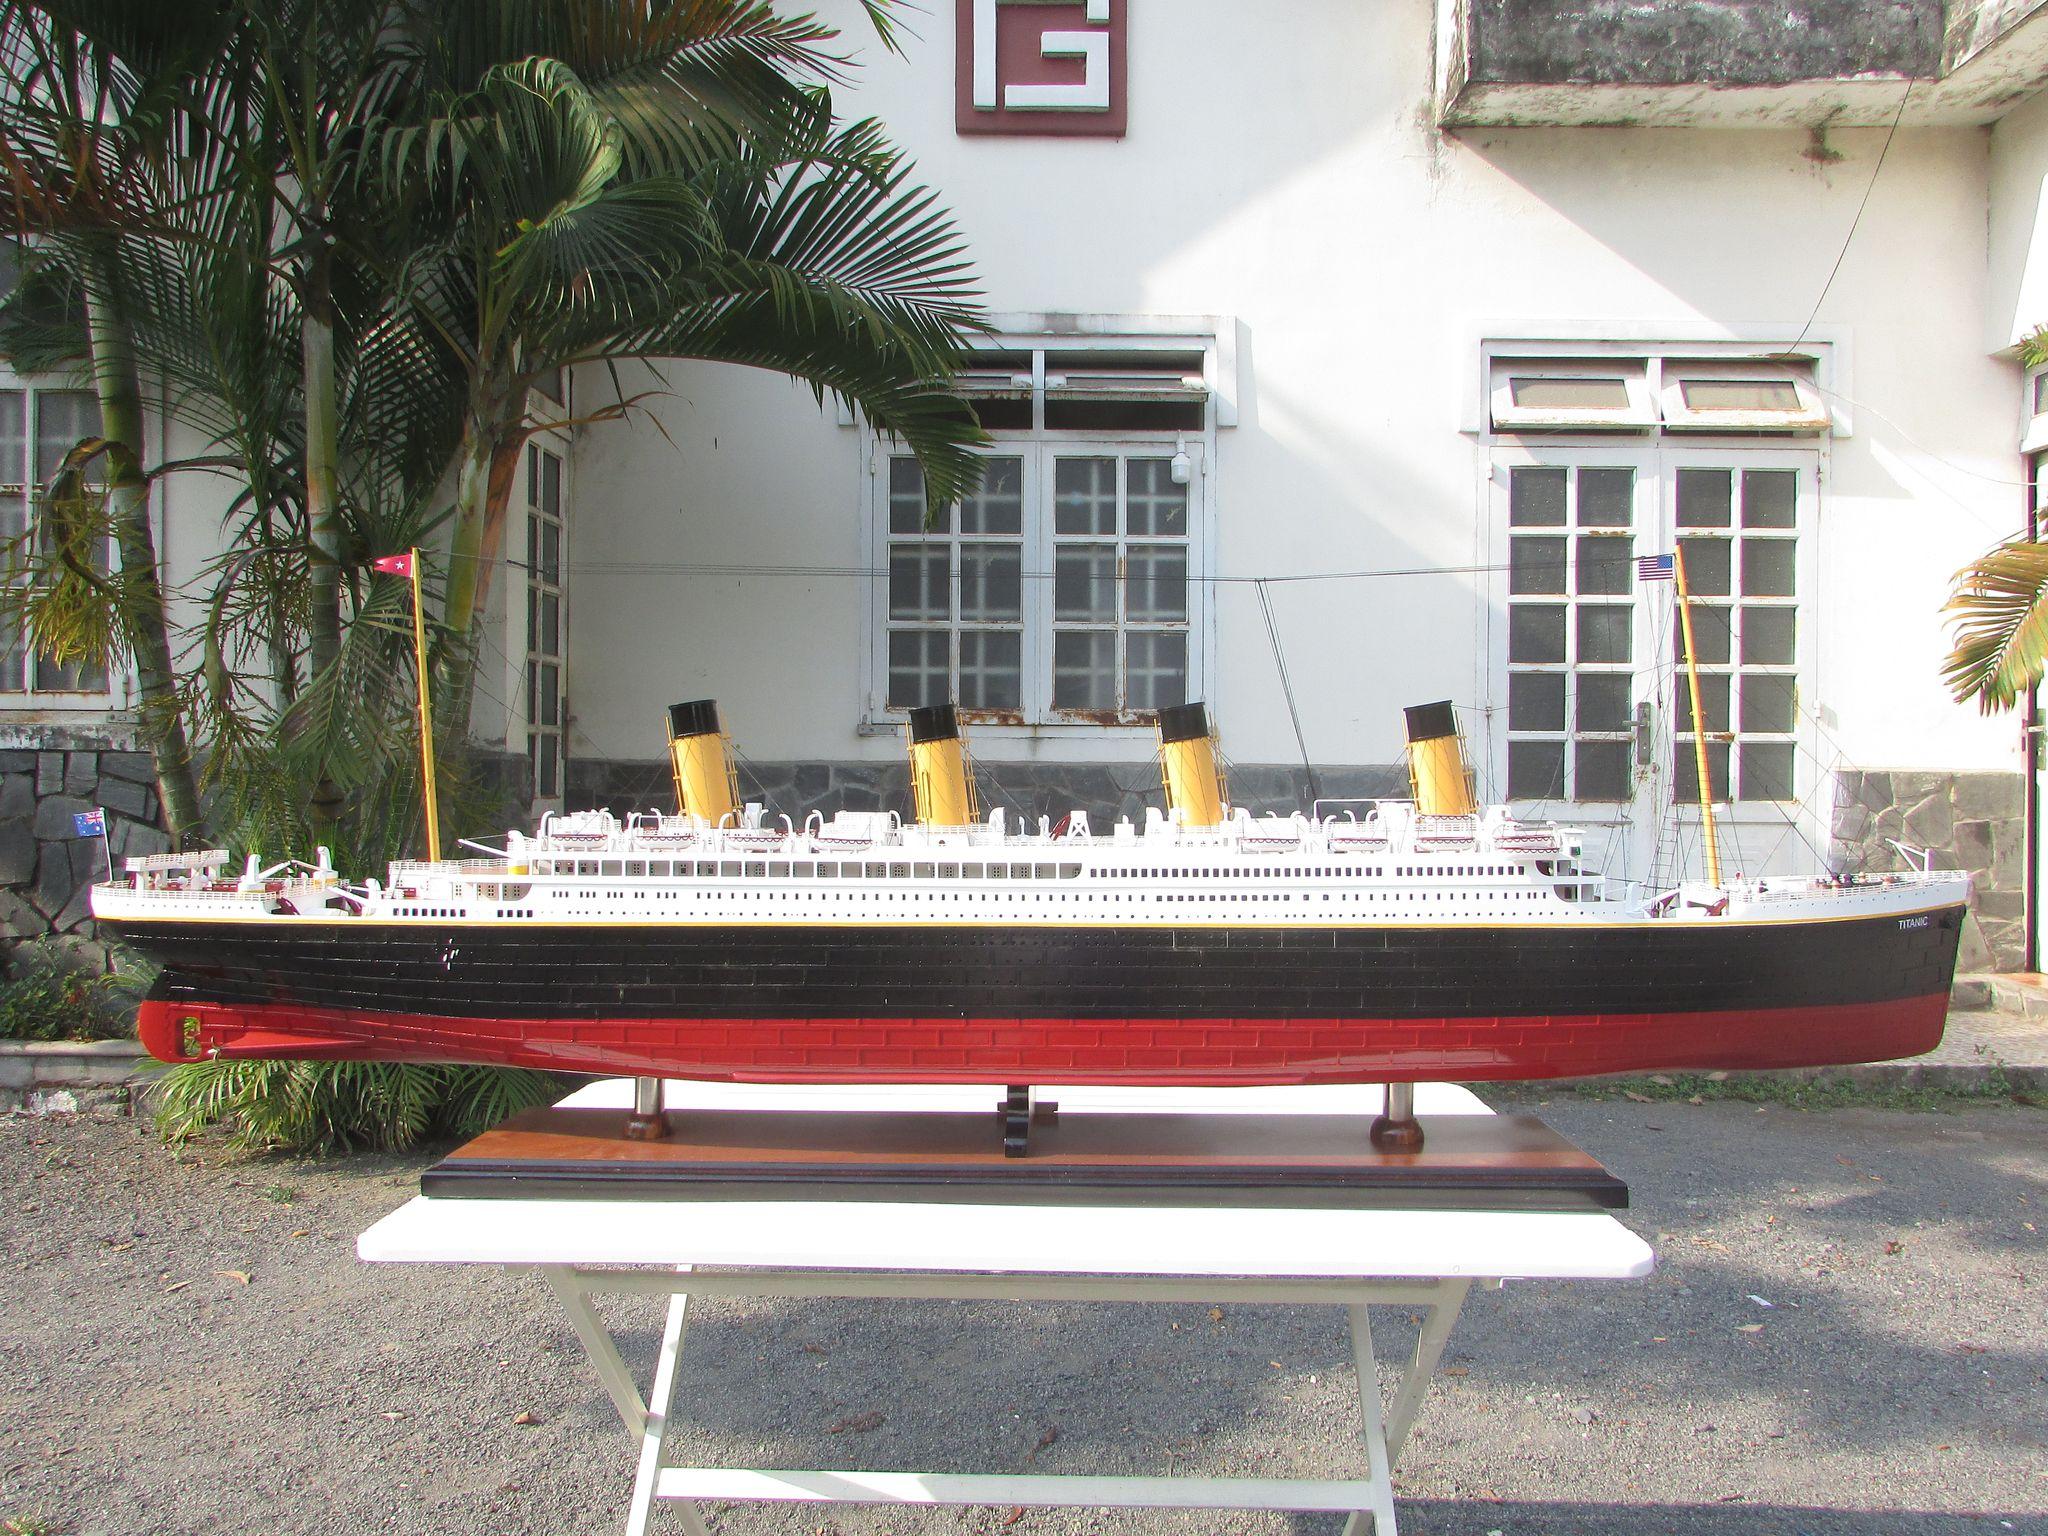 RMS Titanic Painted - GN (CS0003P-60)